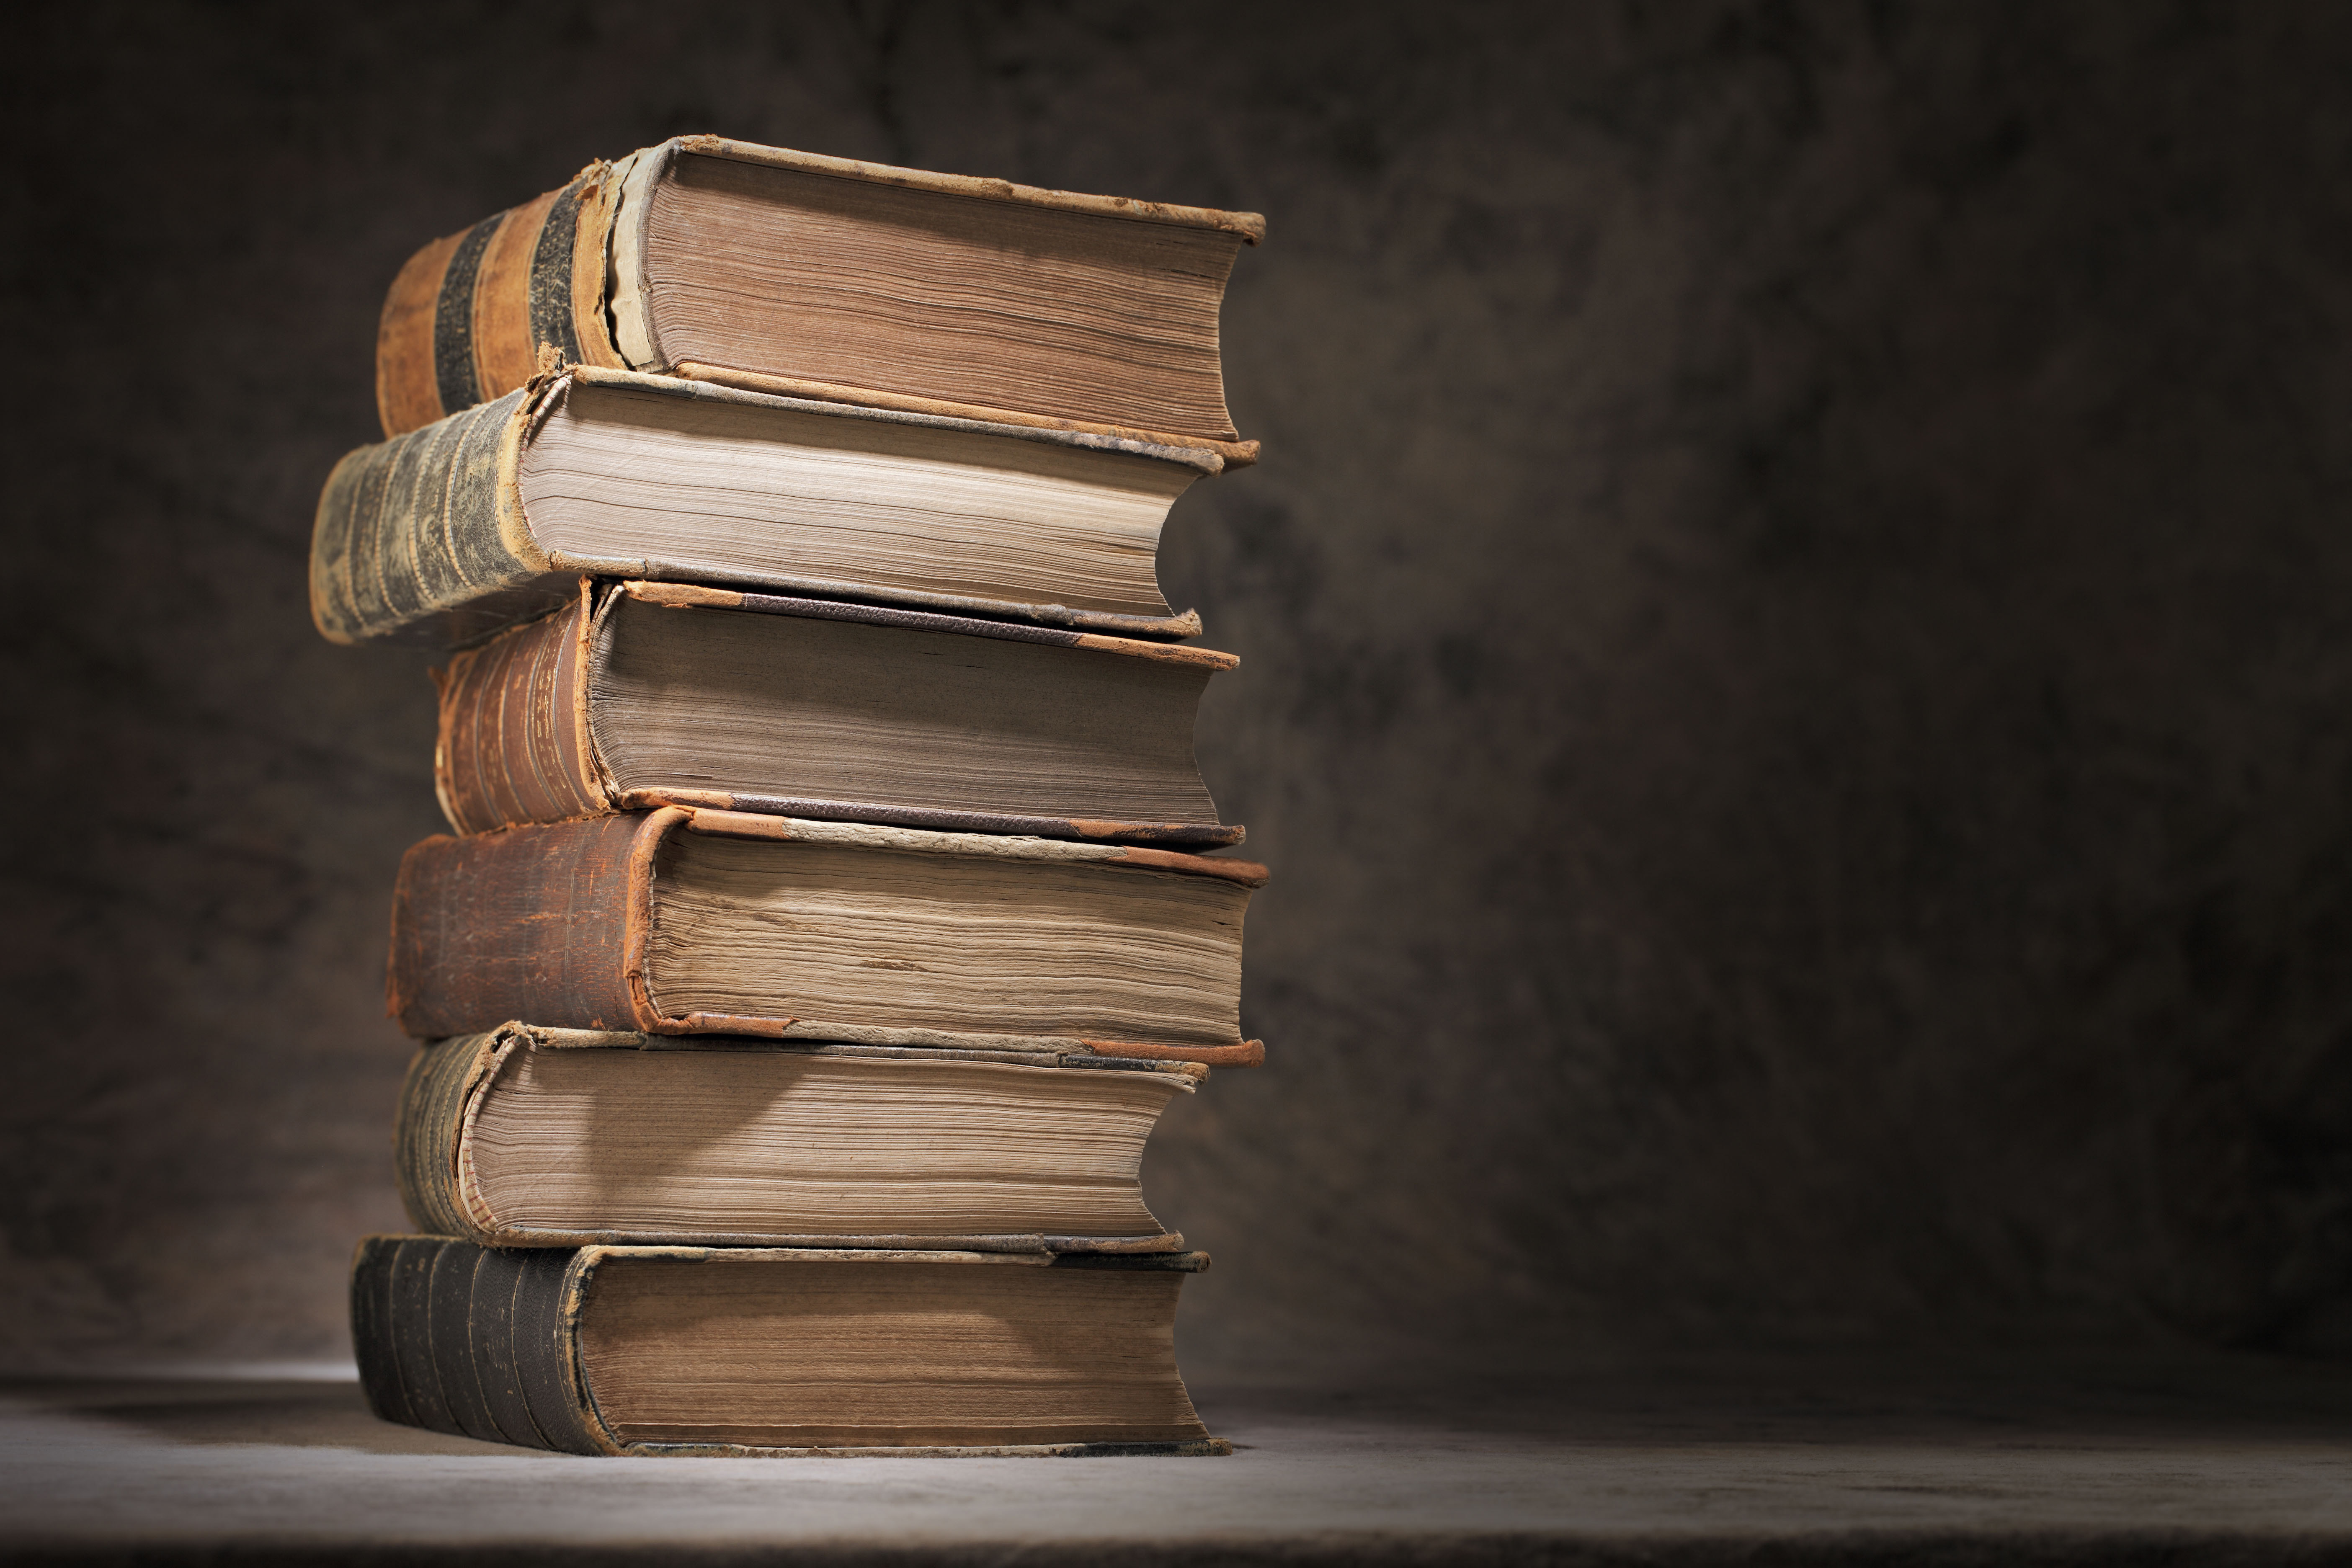 книга слова макро book words macro  № 1998368 загрузить